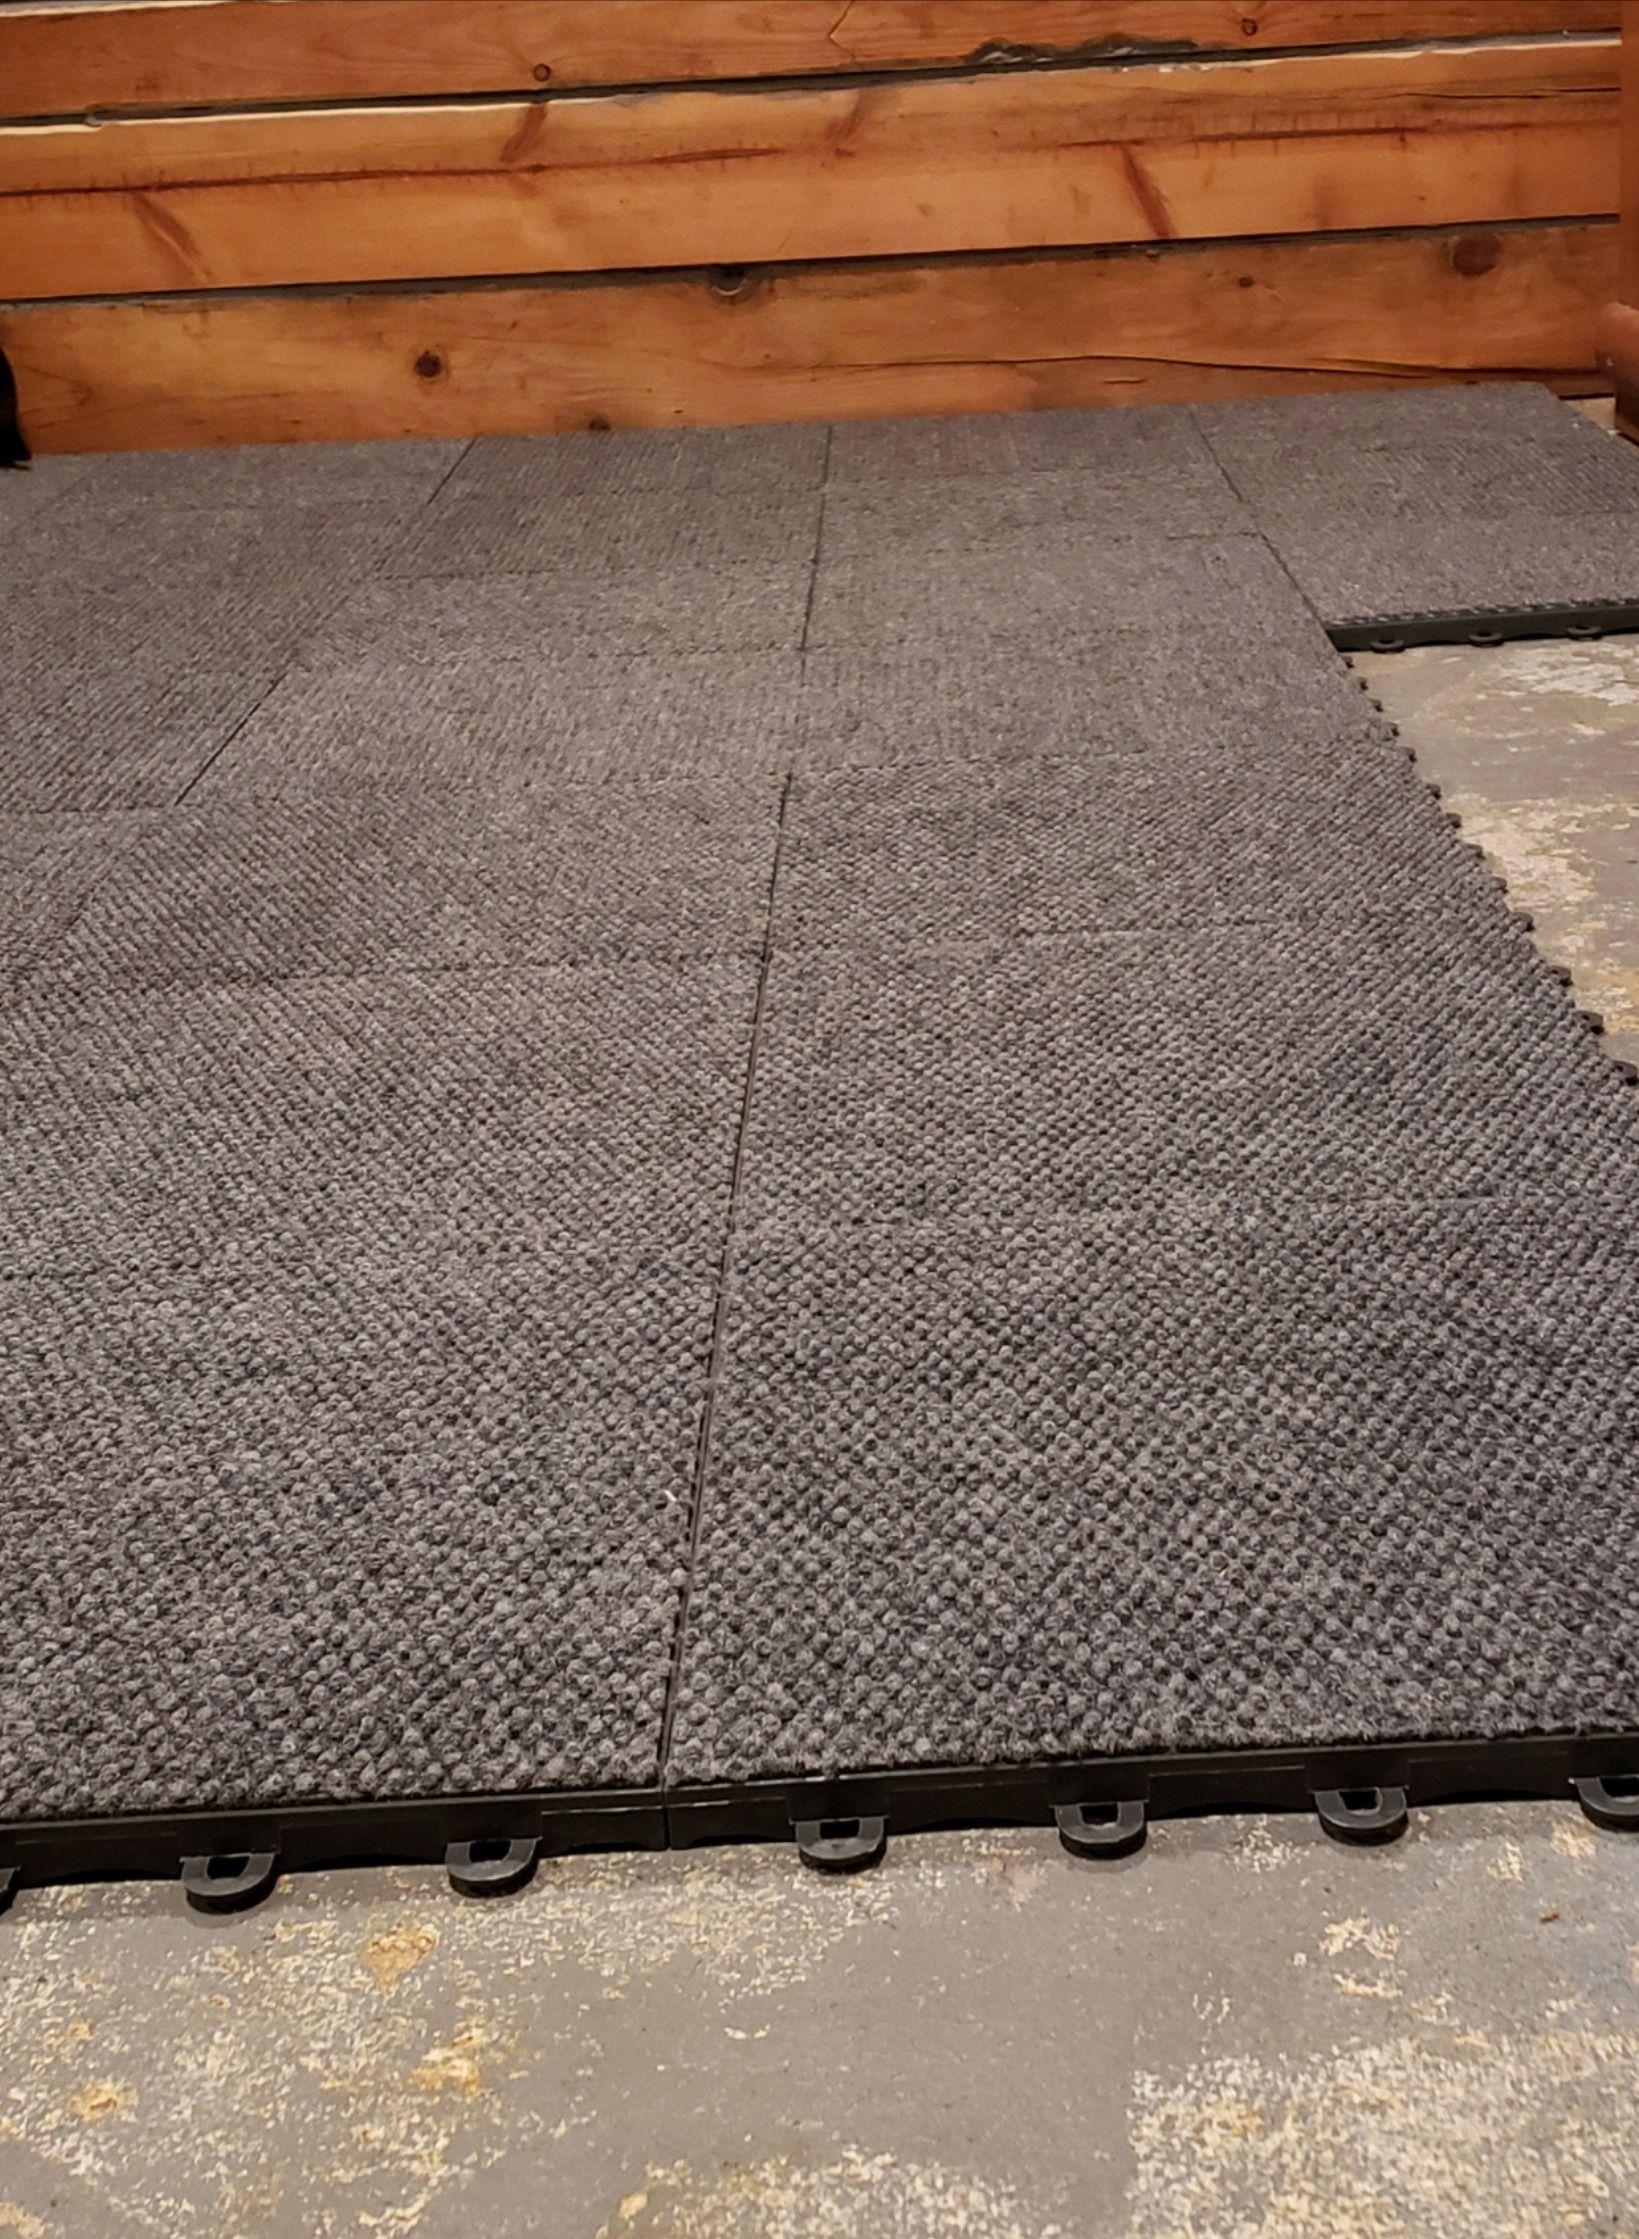 Basement Modular Carpet Tiles With A Raised Lock Togther Base In 2020 Carpet Tiles Basement Carpet Tiles Basement Flooring Options